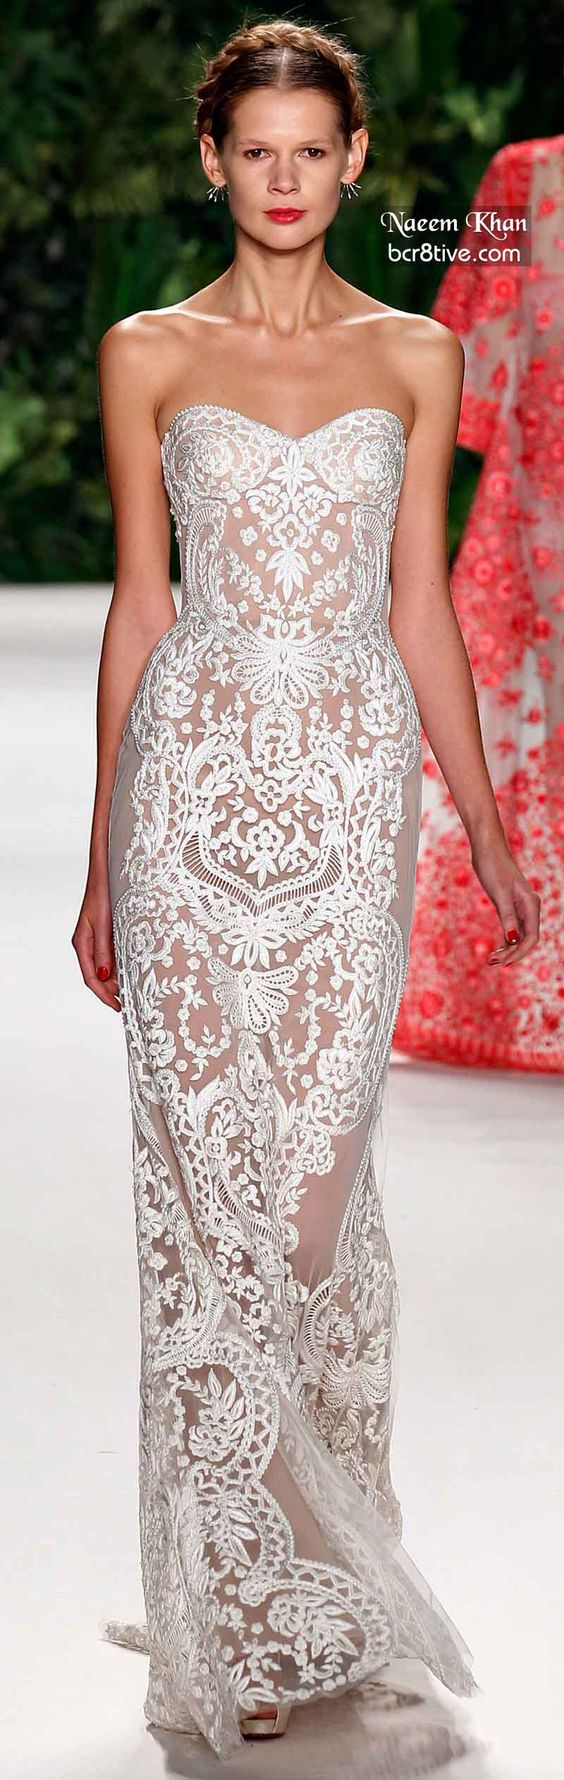 Naeem Khan Spring 2014 | white | sweetheart neckline | sheath | guipure lace | high fashion